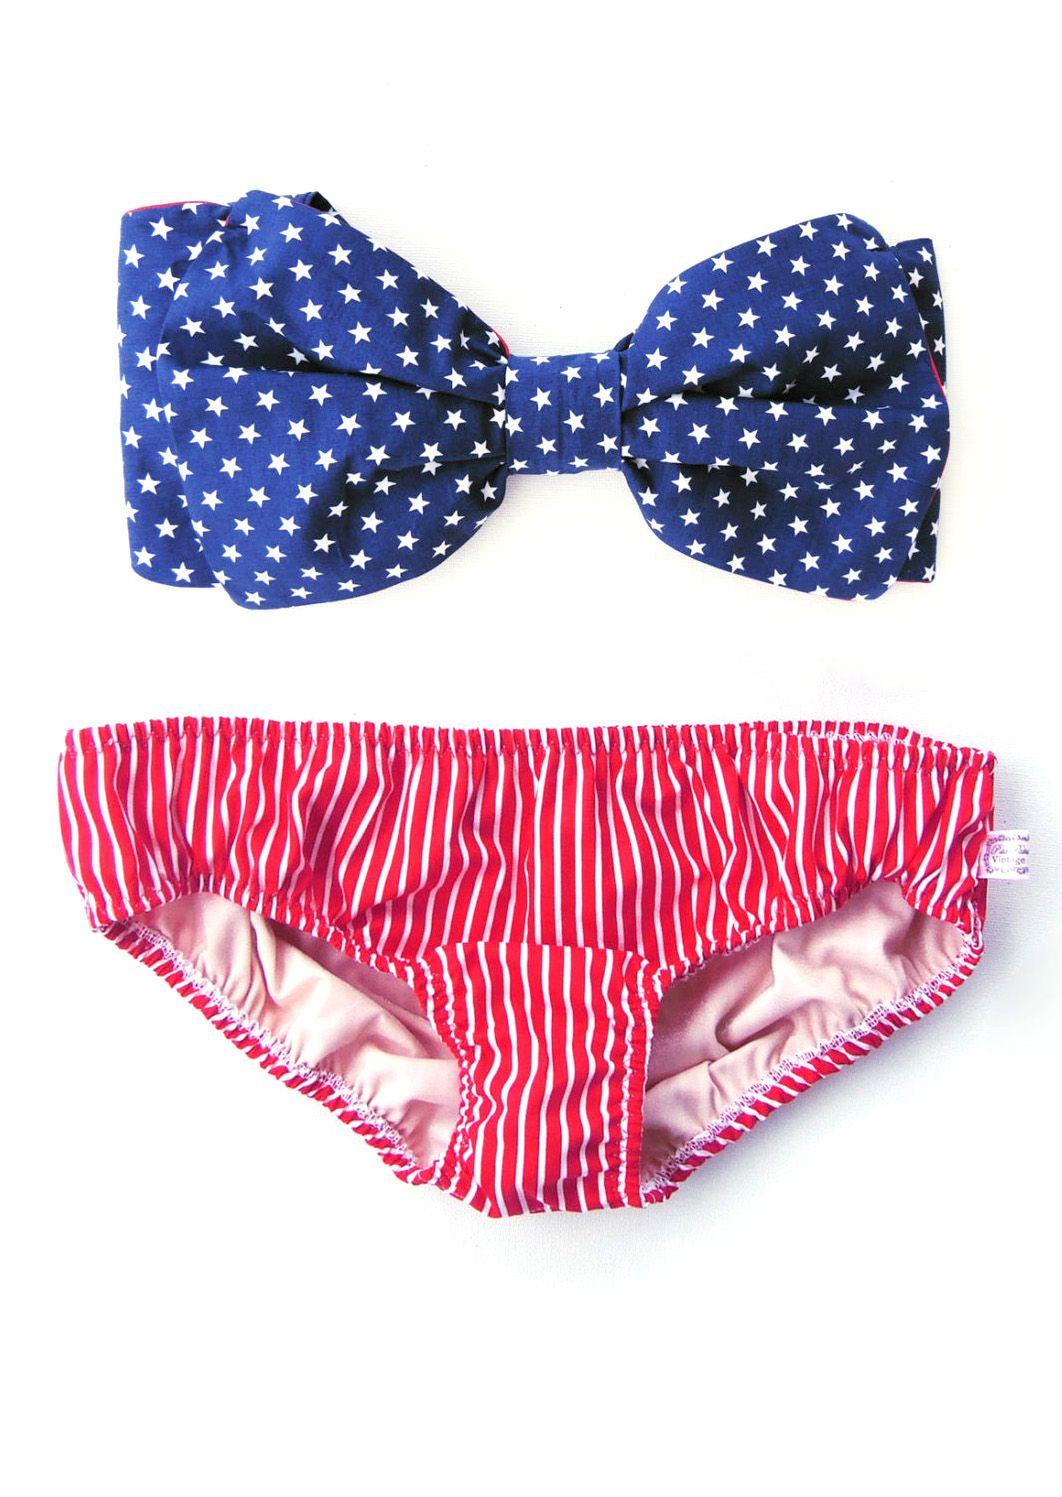 89c10db18396 All Cotton Vintage Bow Bikini Style Bandeau Sunsuit. DiVa Halter ...